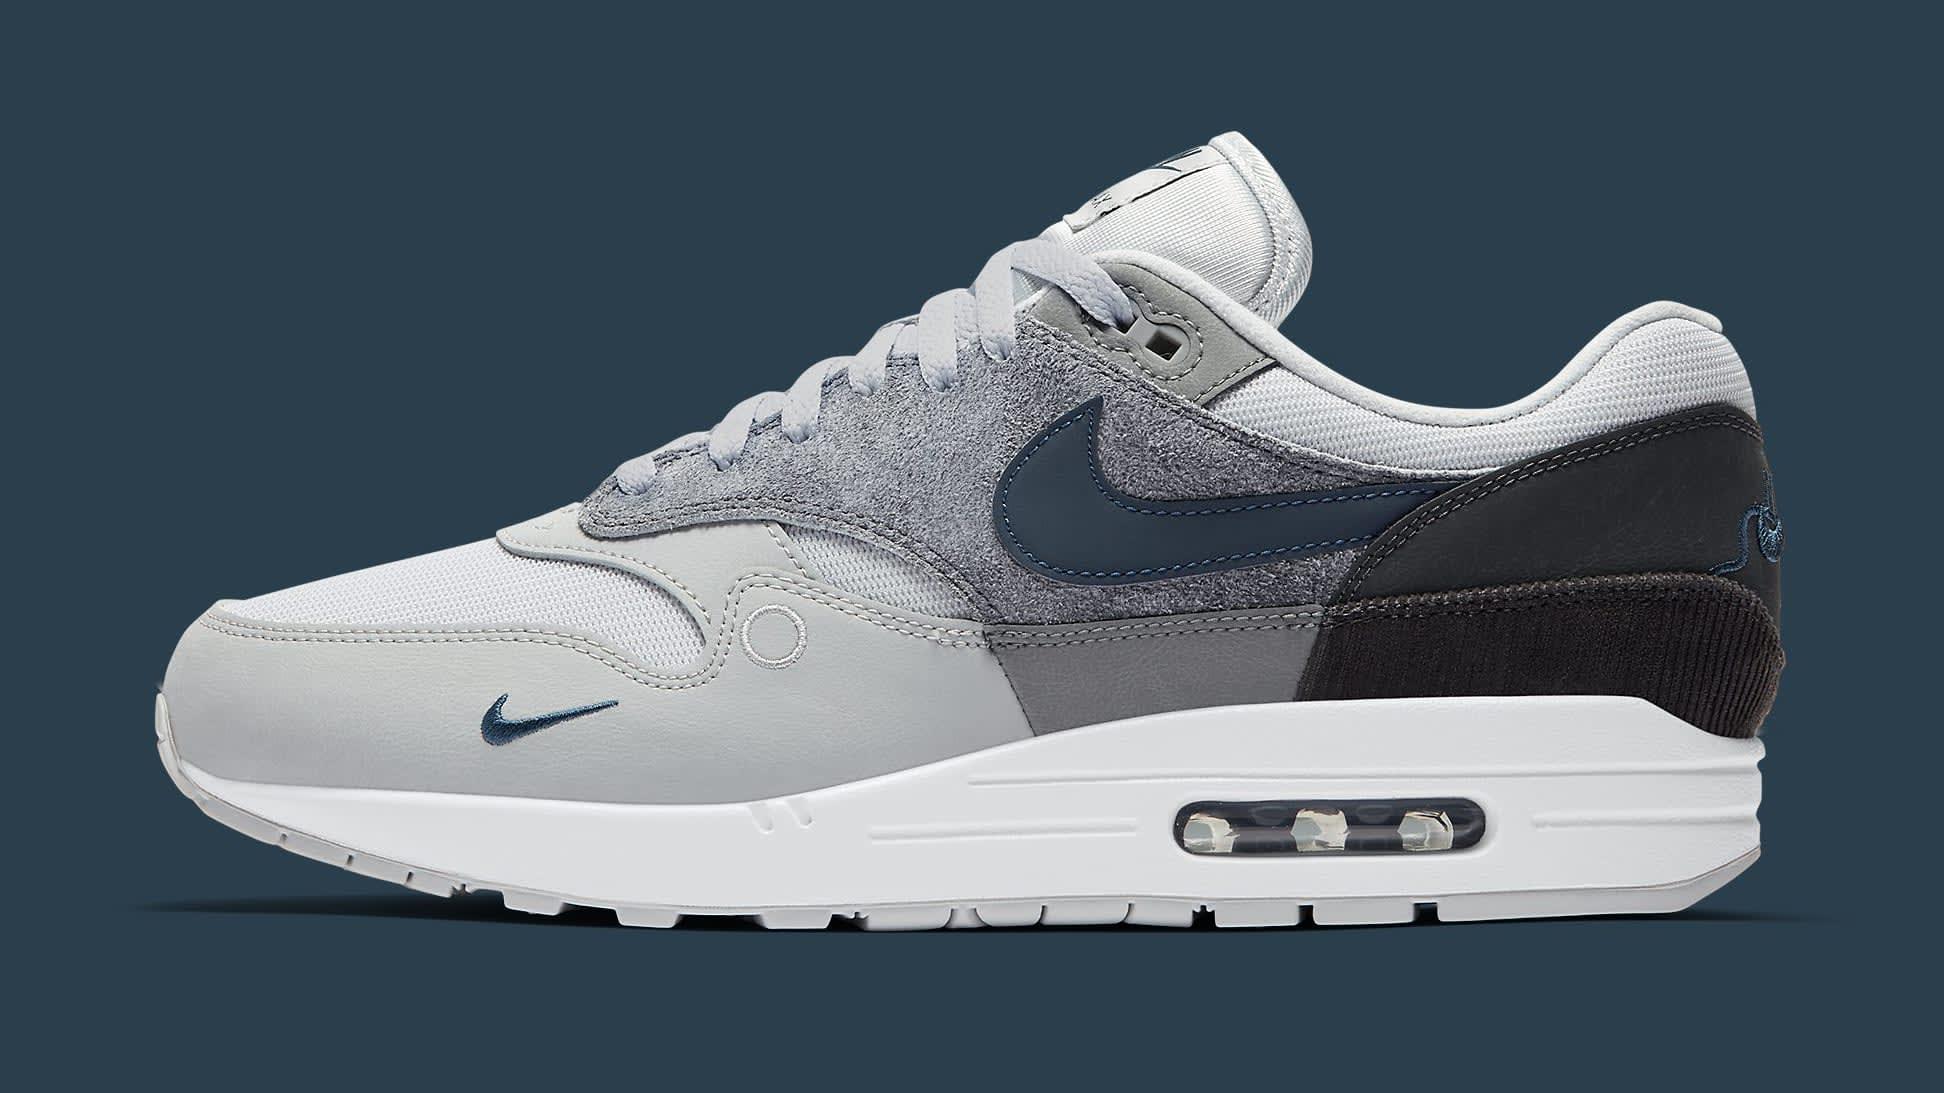 Nike Air Max 1 'City Pack/London'